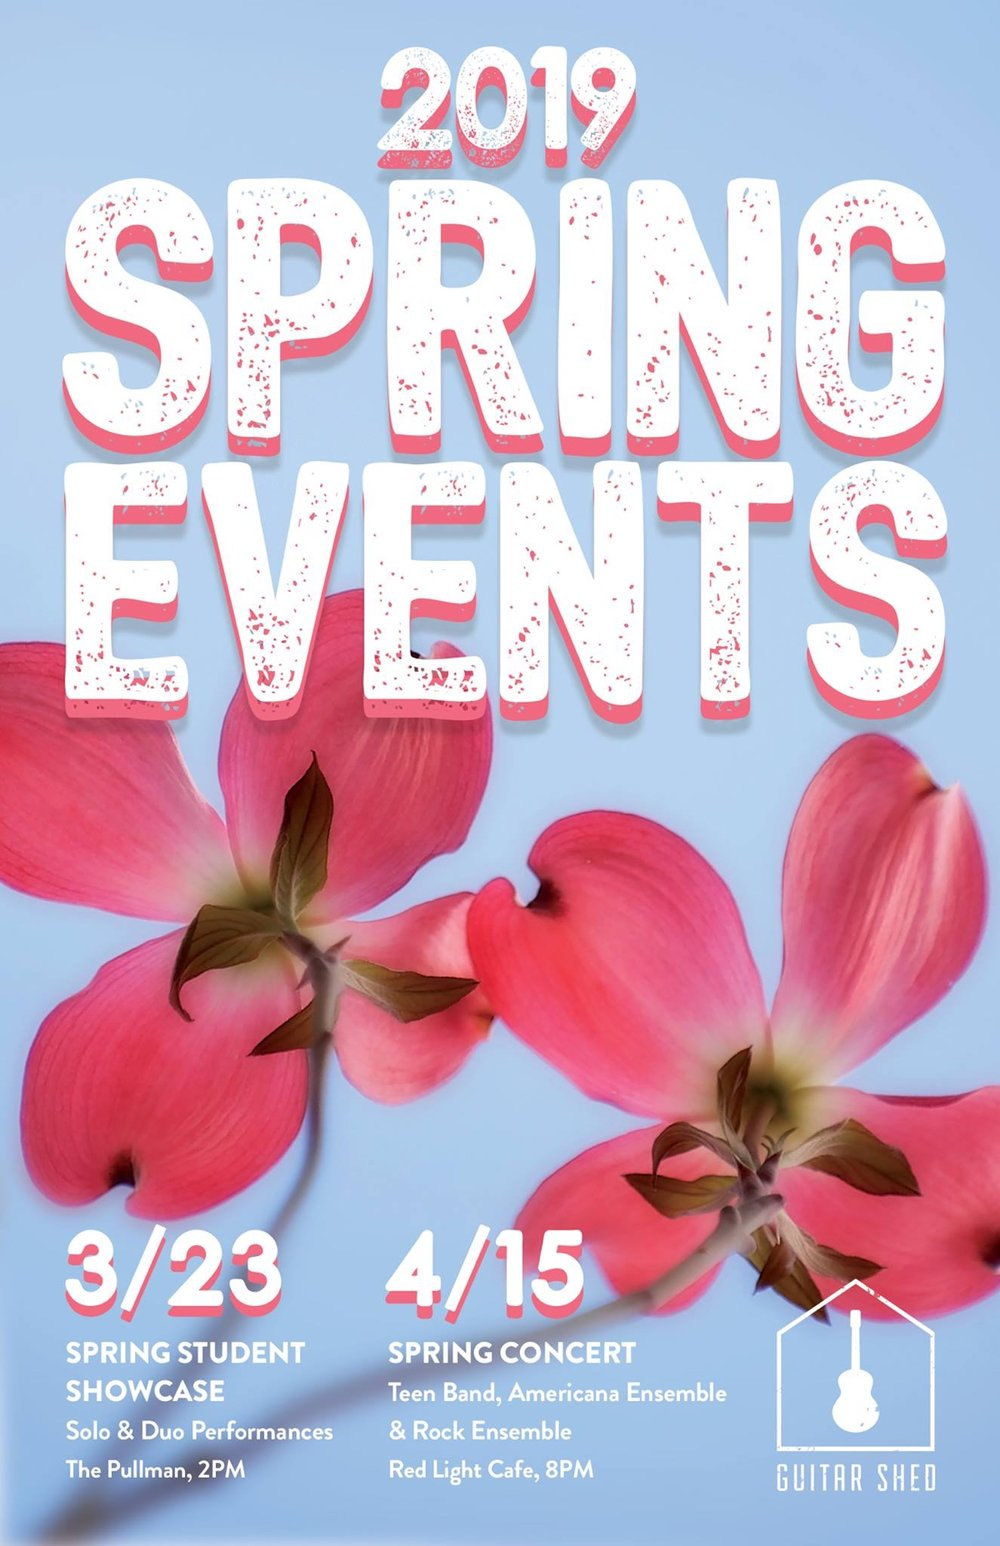 Guitar Shed Spring Concert — April 15, 2019 — Red Light Café, Atlanta, GA